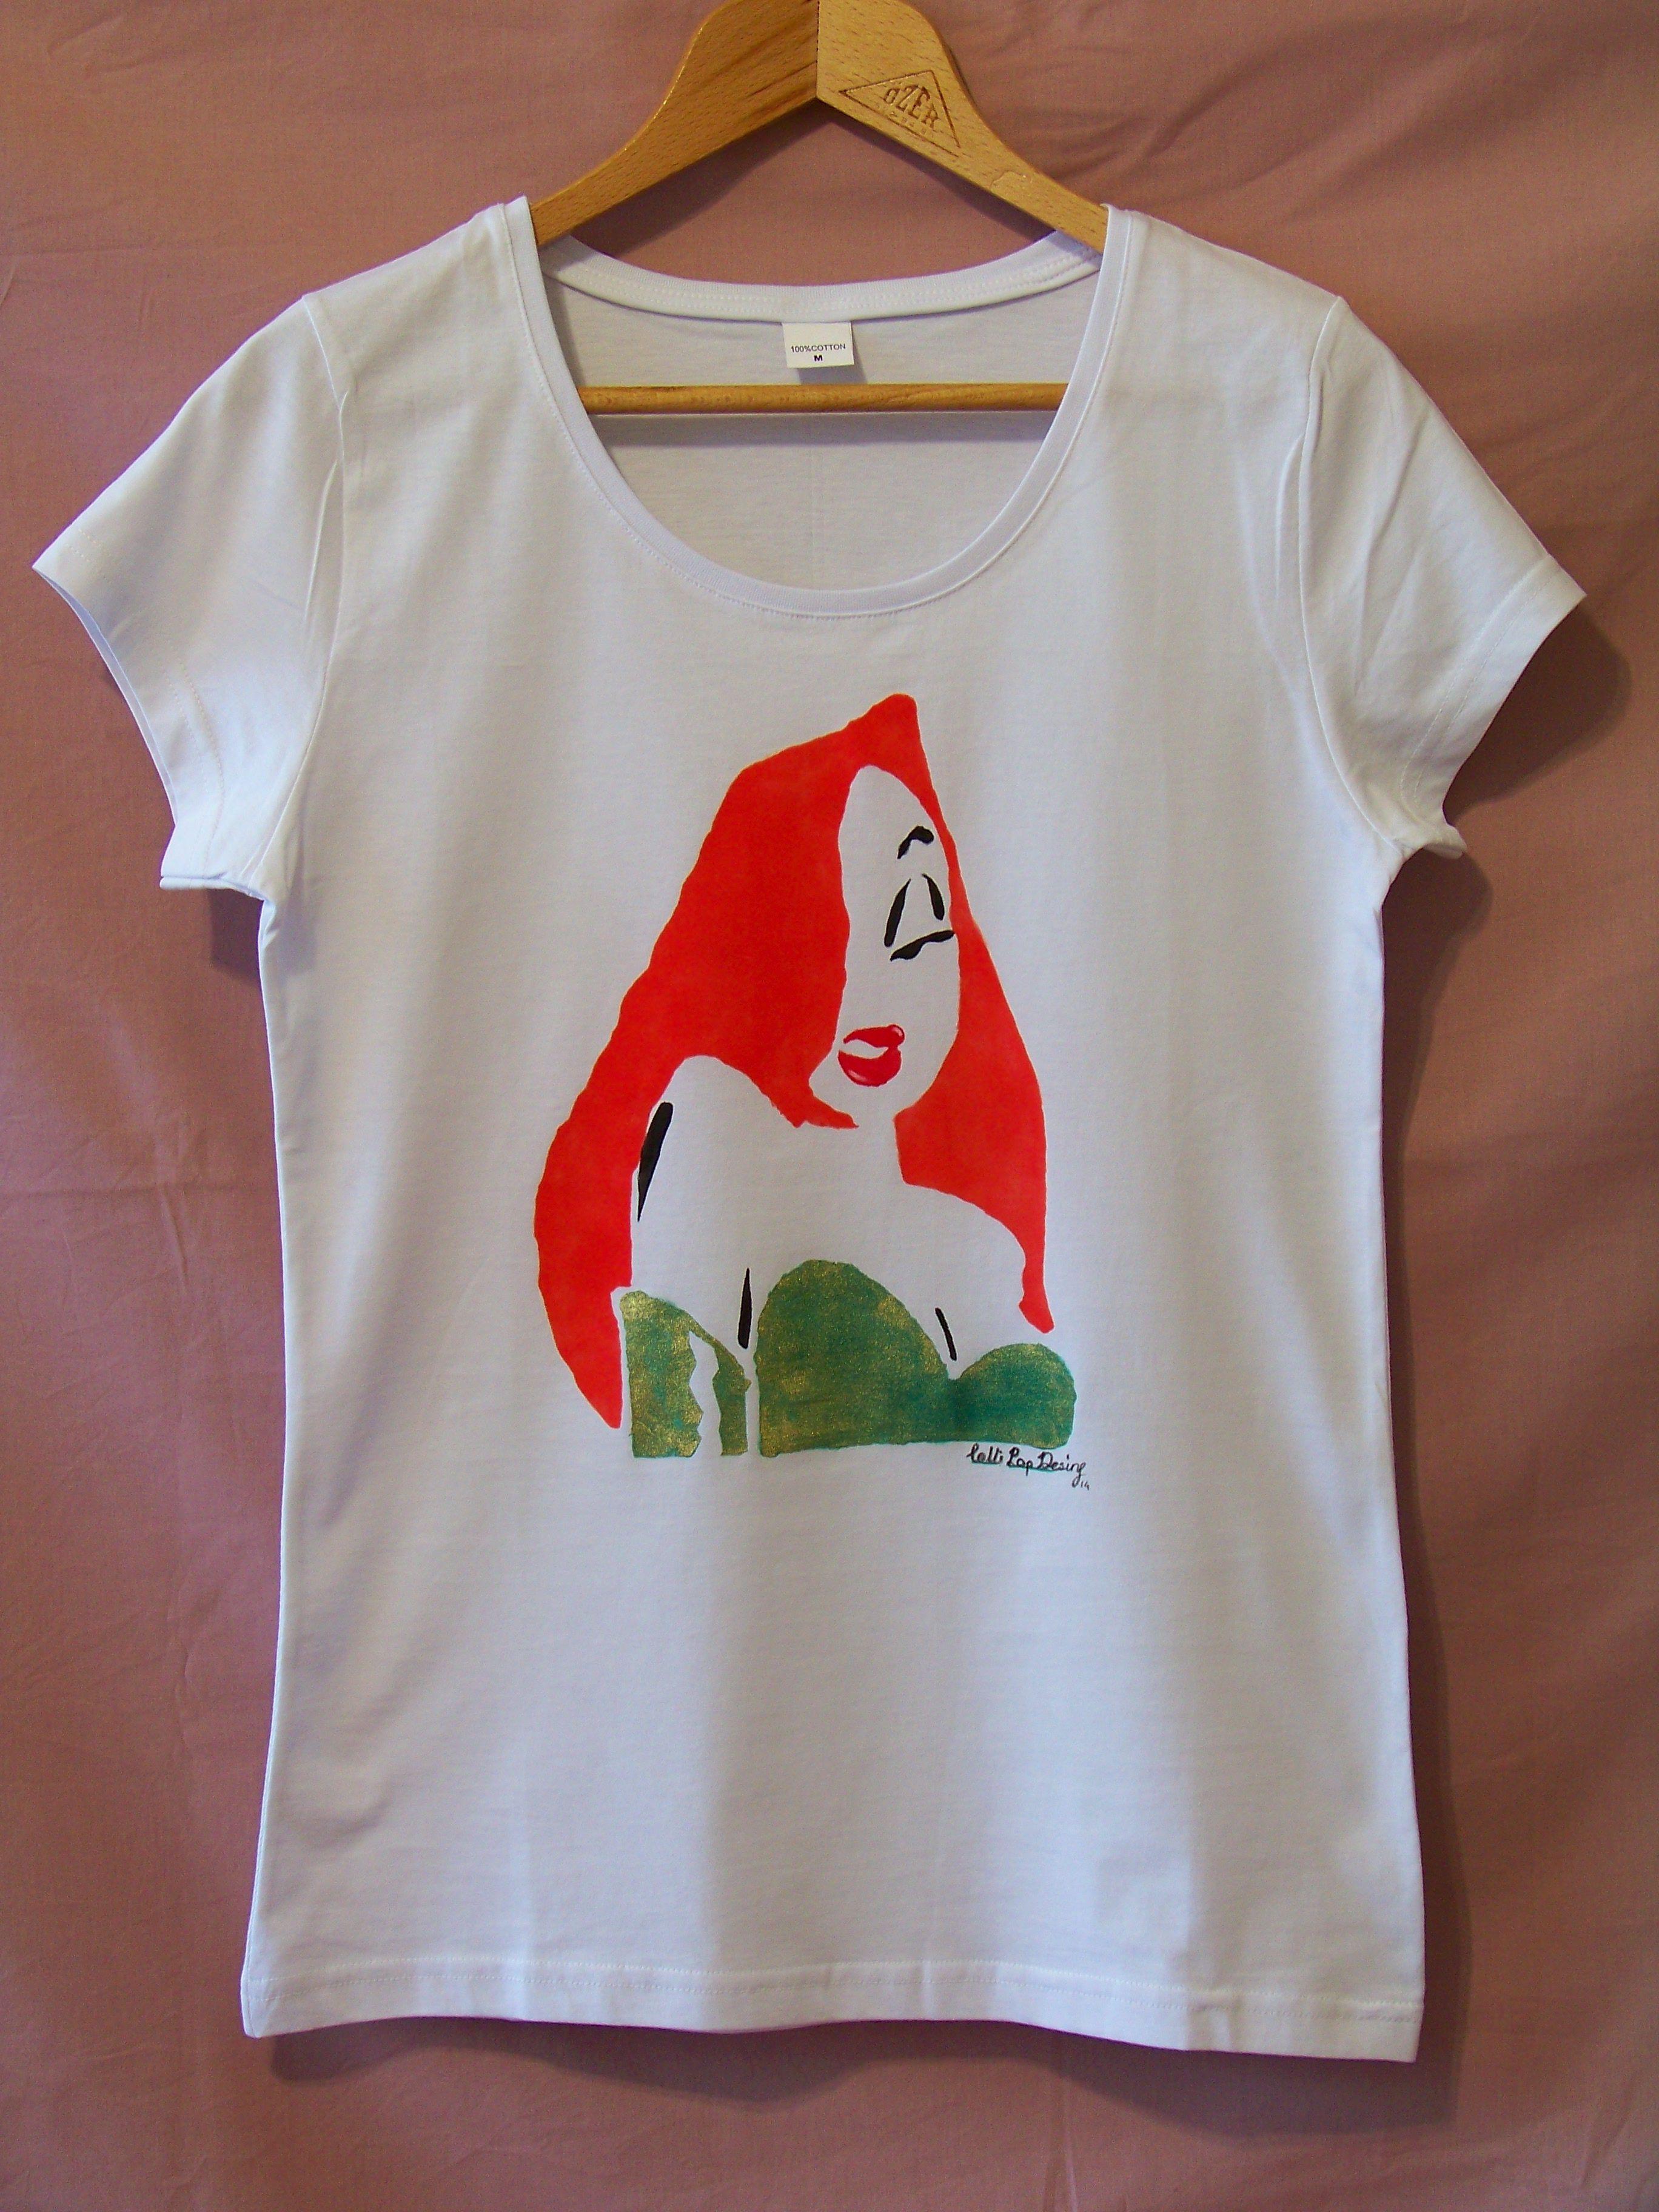 T shirt handmade design - Jessica Rabbit Thelollipopdesign Handmade Design Accessories Customdesign